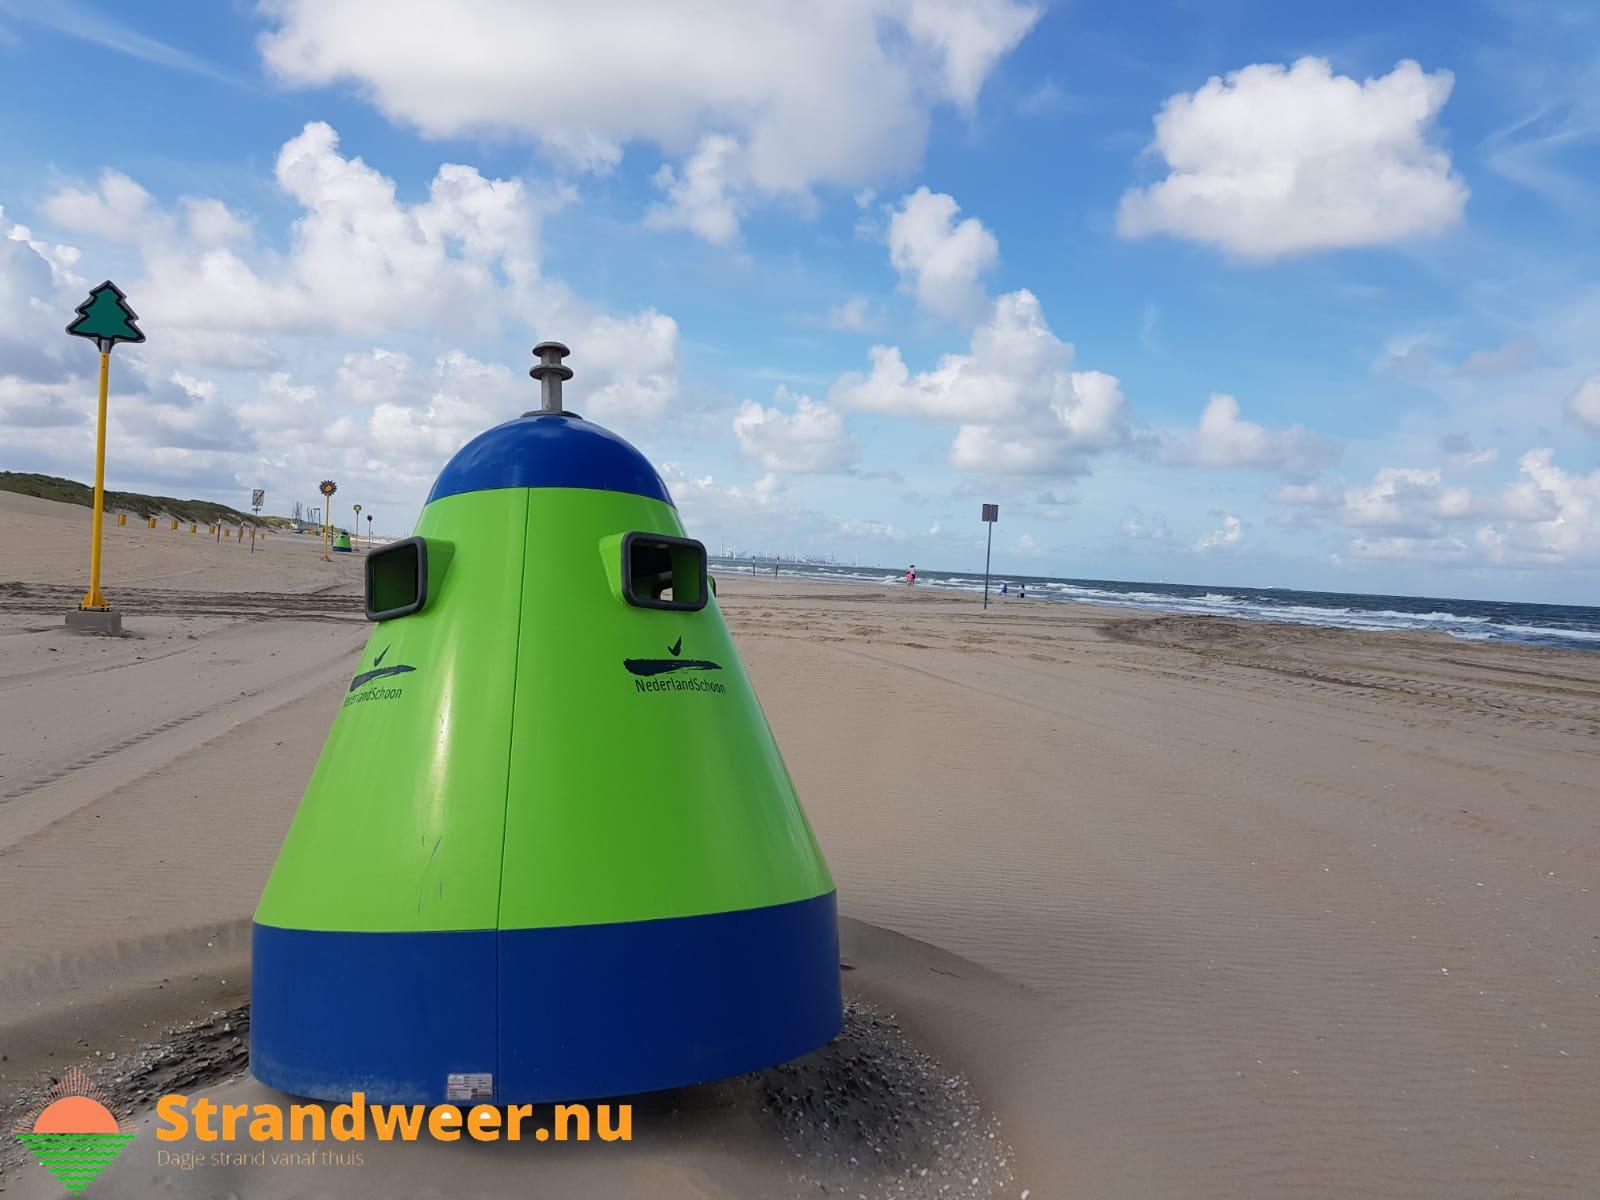 Het strandweer voor donderdag 5 december